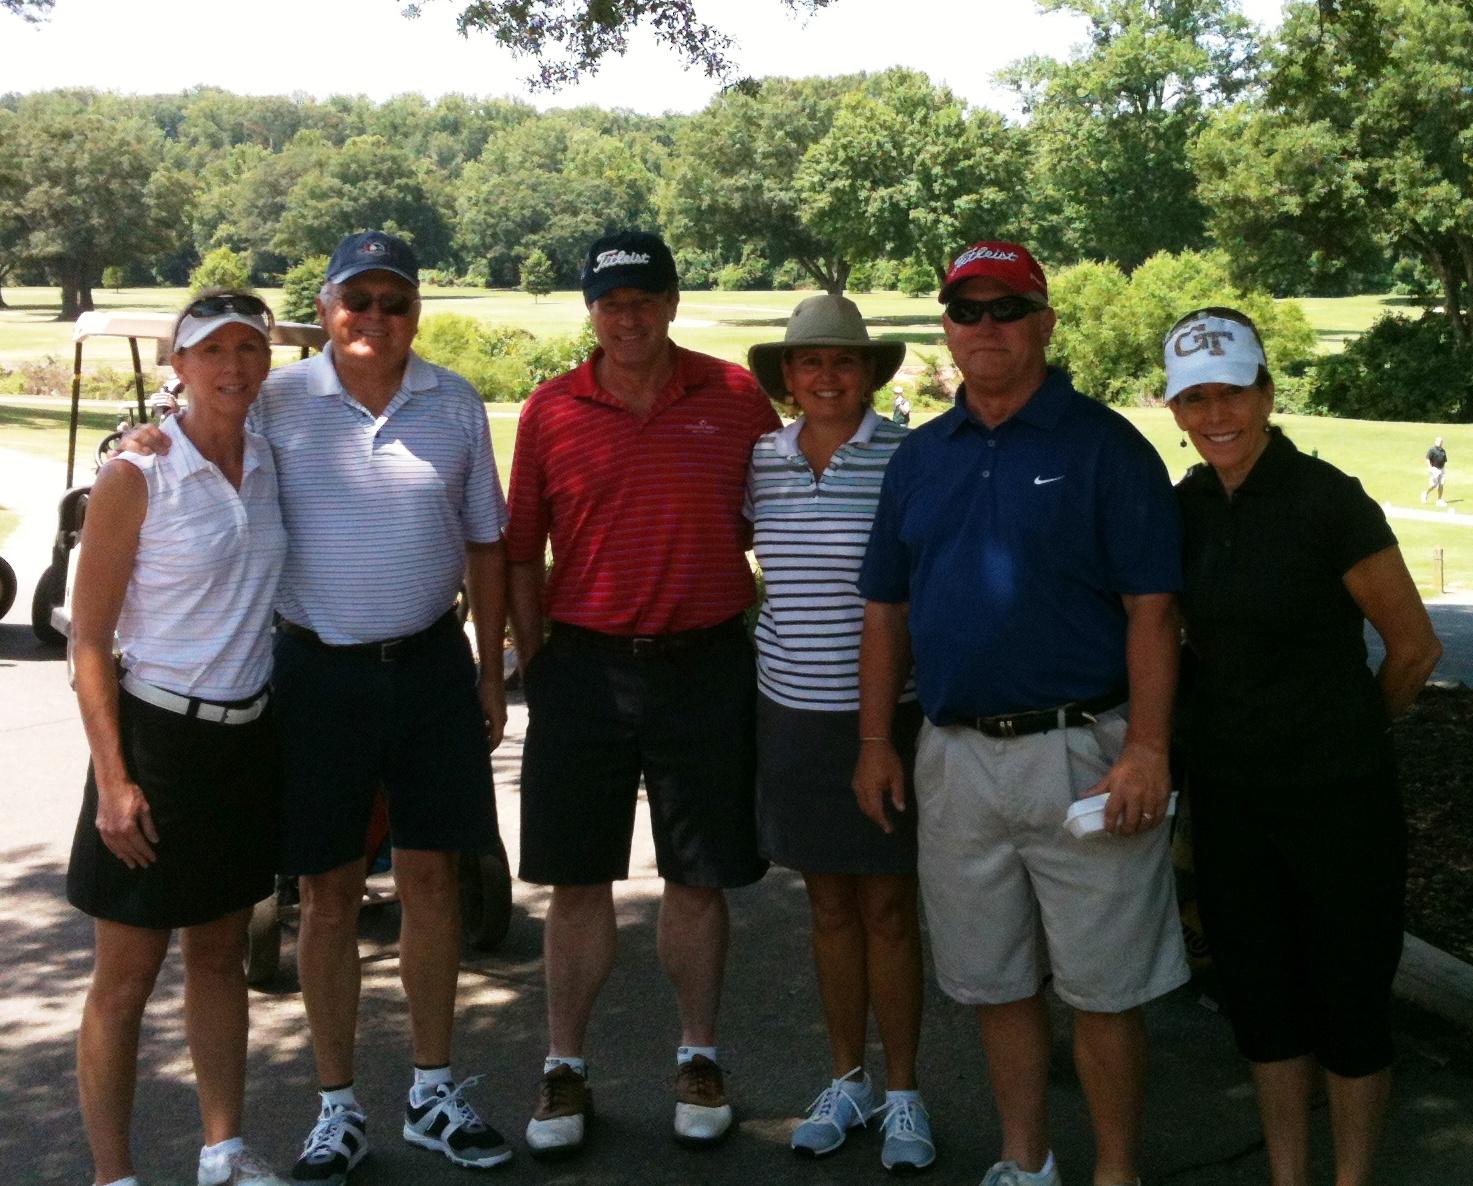 2012 BJGC championship day 2 - Linda, Larry, Bernard, Peggy, Eddie and Susan.jpg